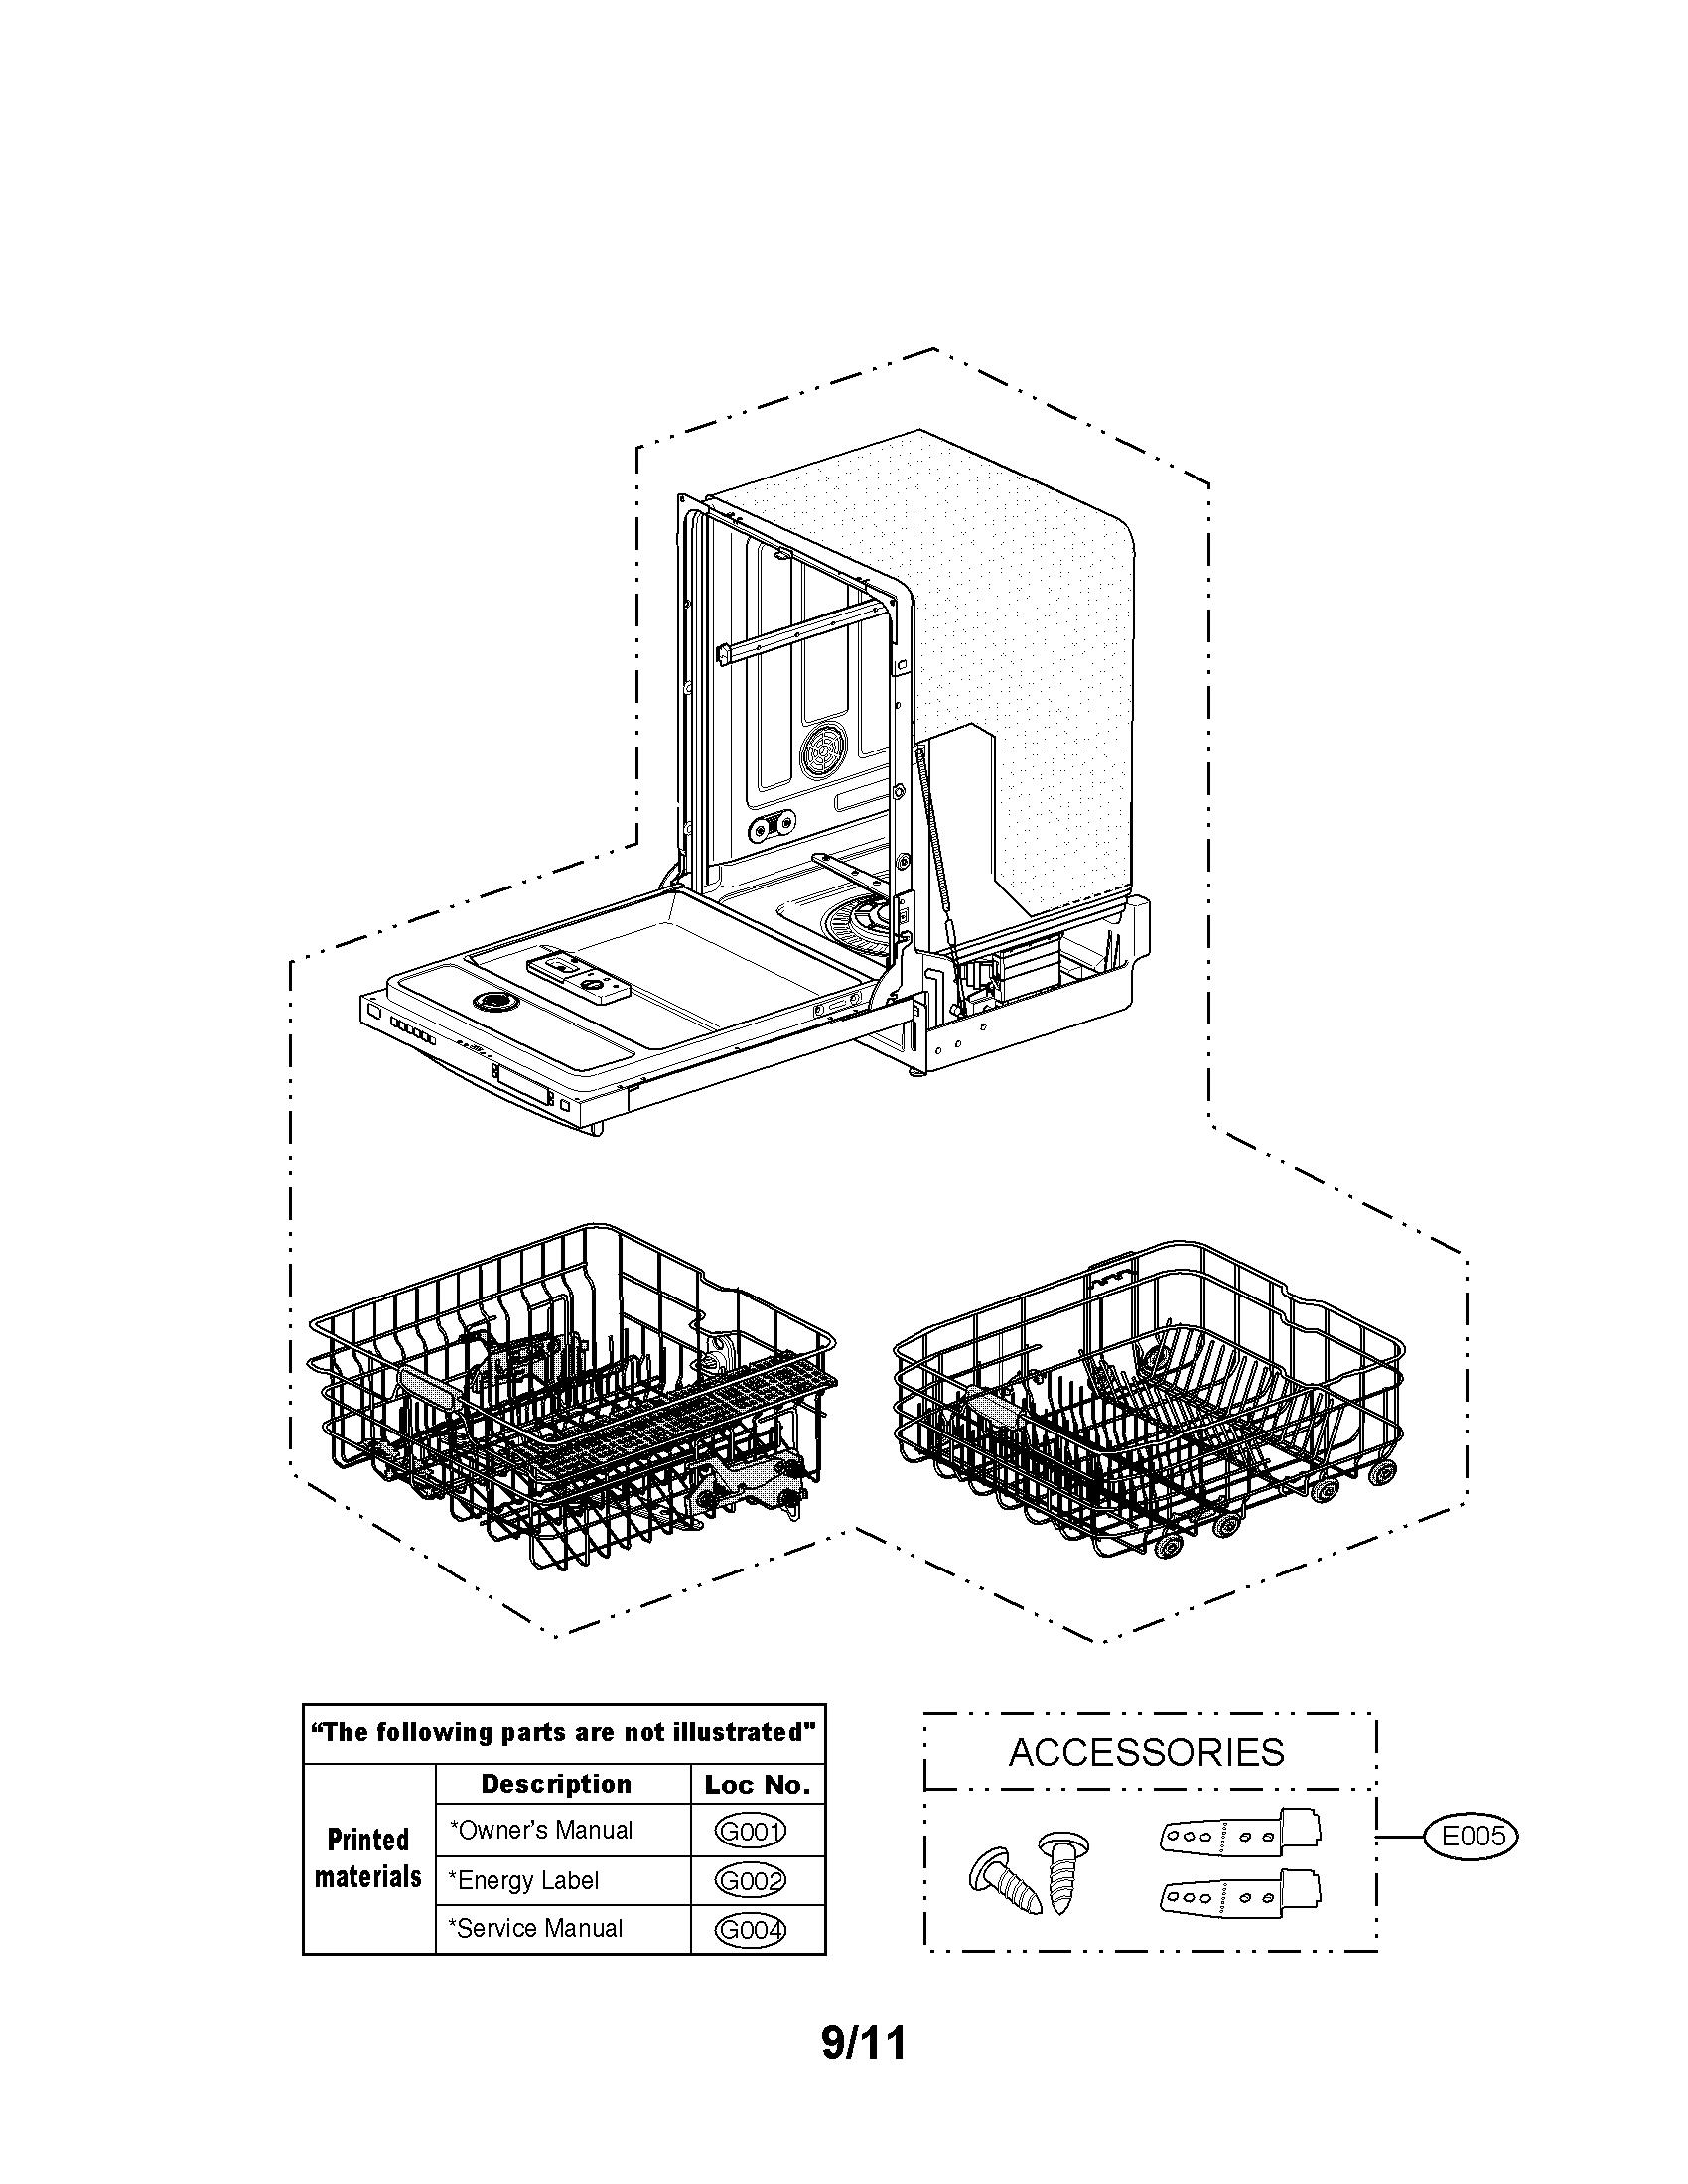 Lg model LSDF995ST dishwasher genuine parts